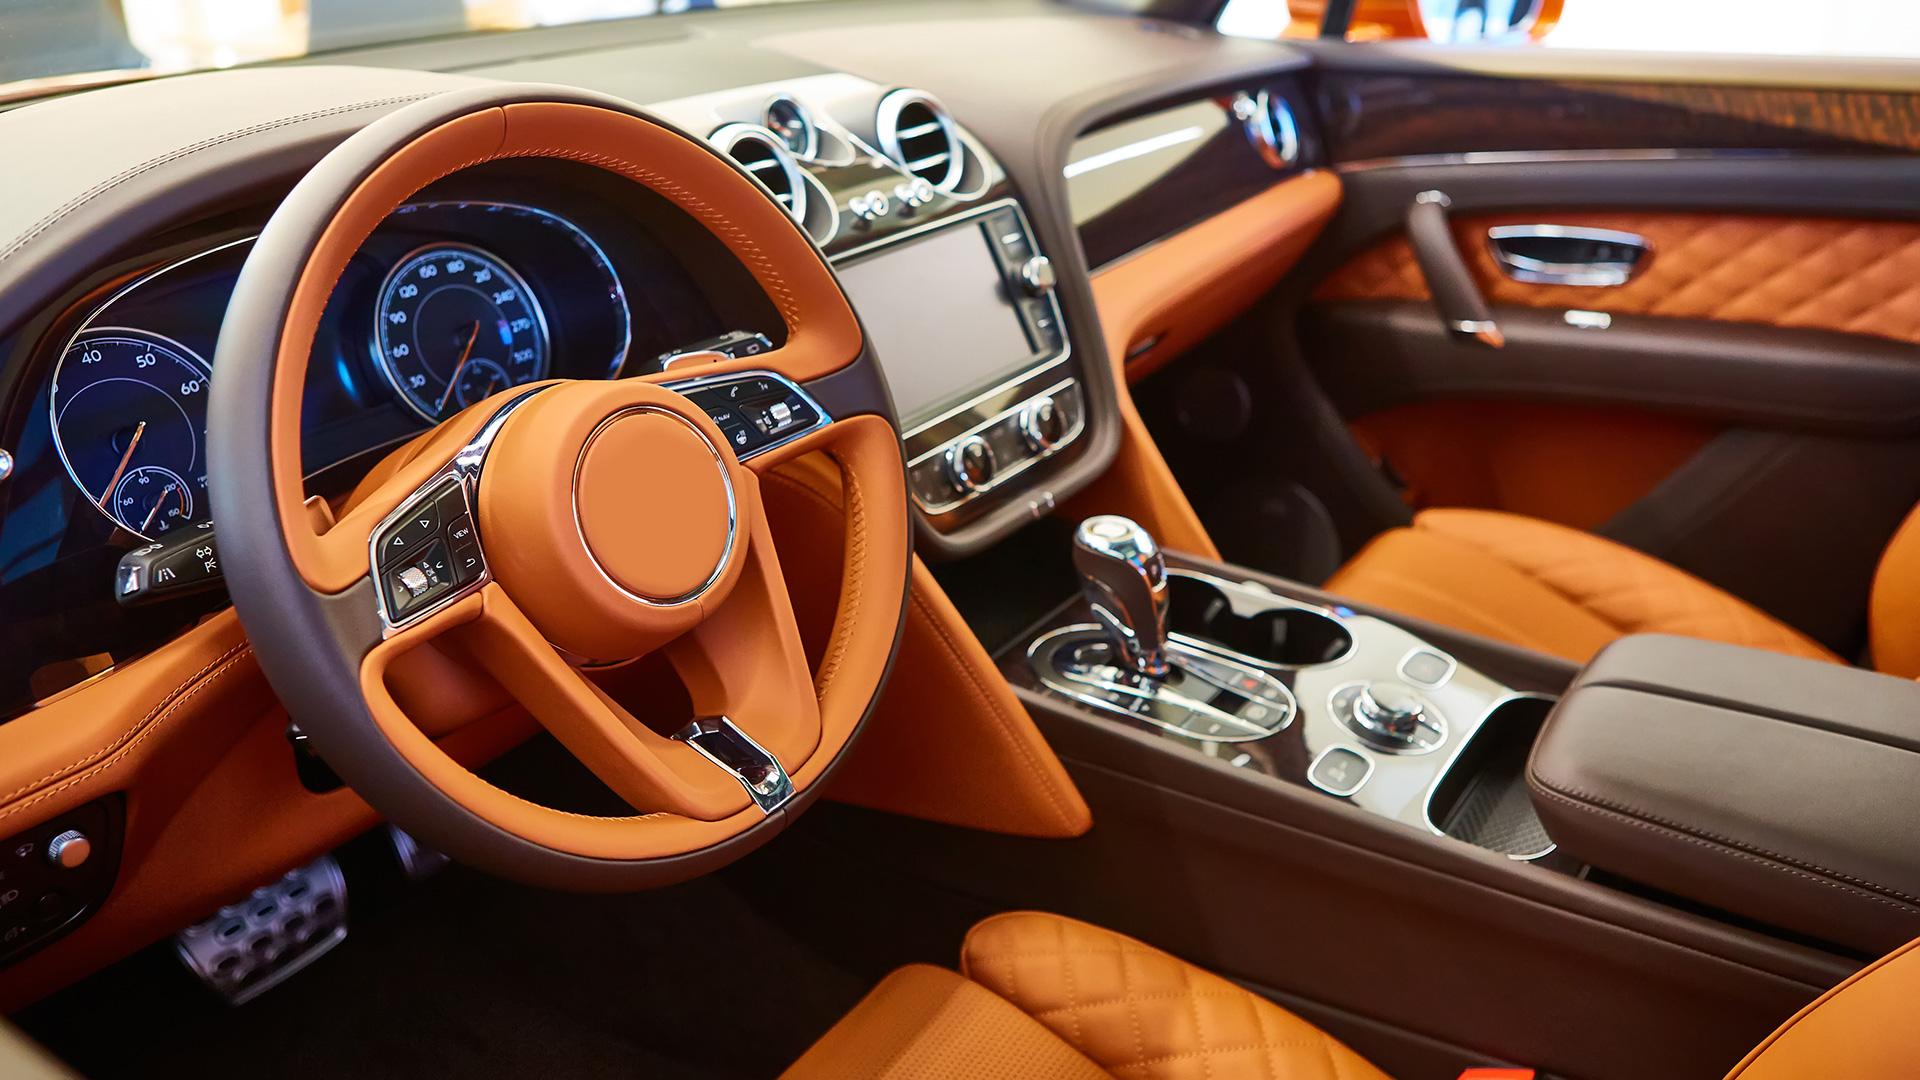 Abbildung Auto Innenraum Leder